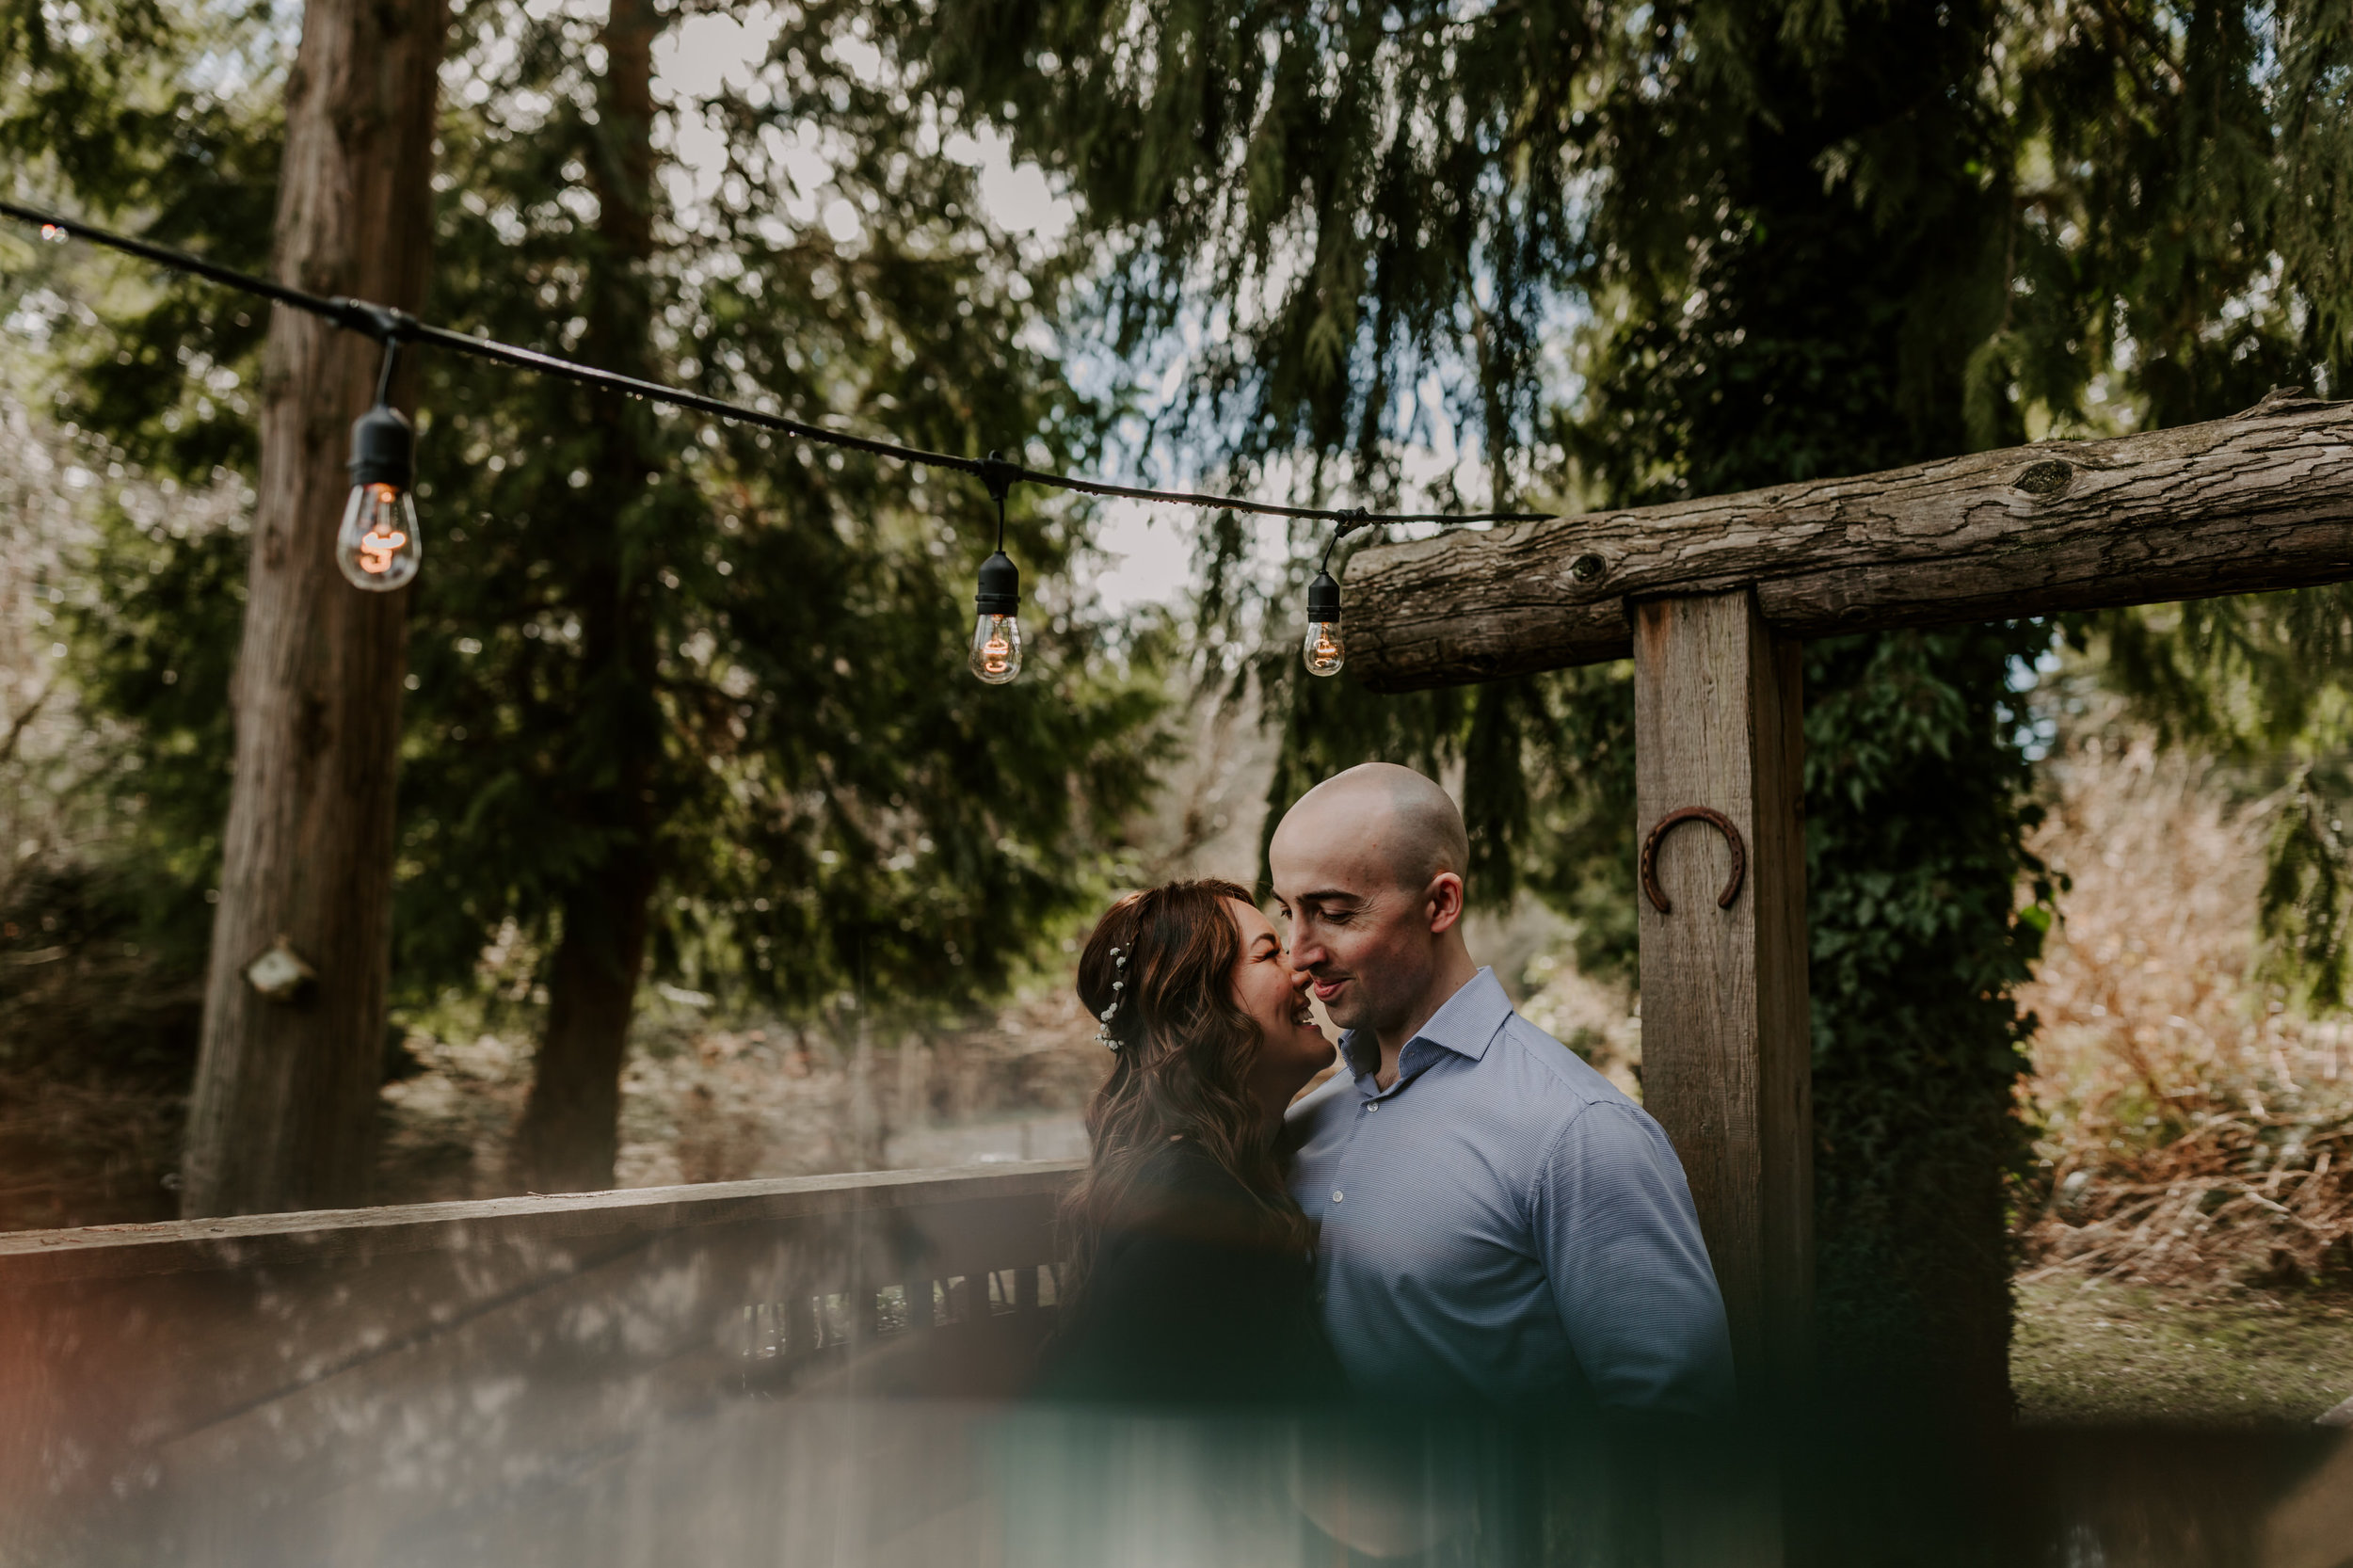 Sunshine Coast Elopement Photos - Forest Wedding - Beach Wedding - Sunshine Coast Wedding Photographer - Vancouver Wedding Photographer - Vancouver Wedding Videographer - 999.JPG